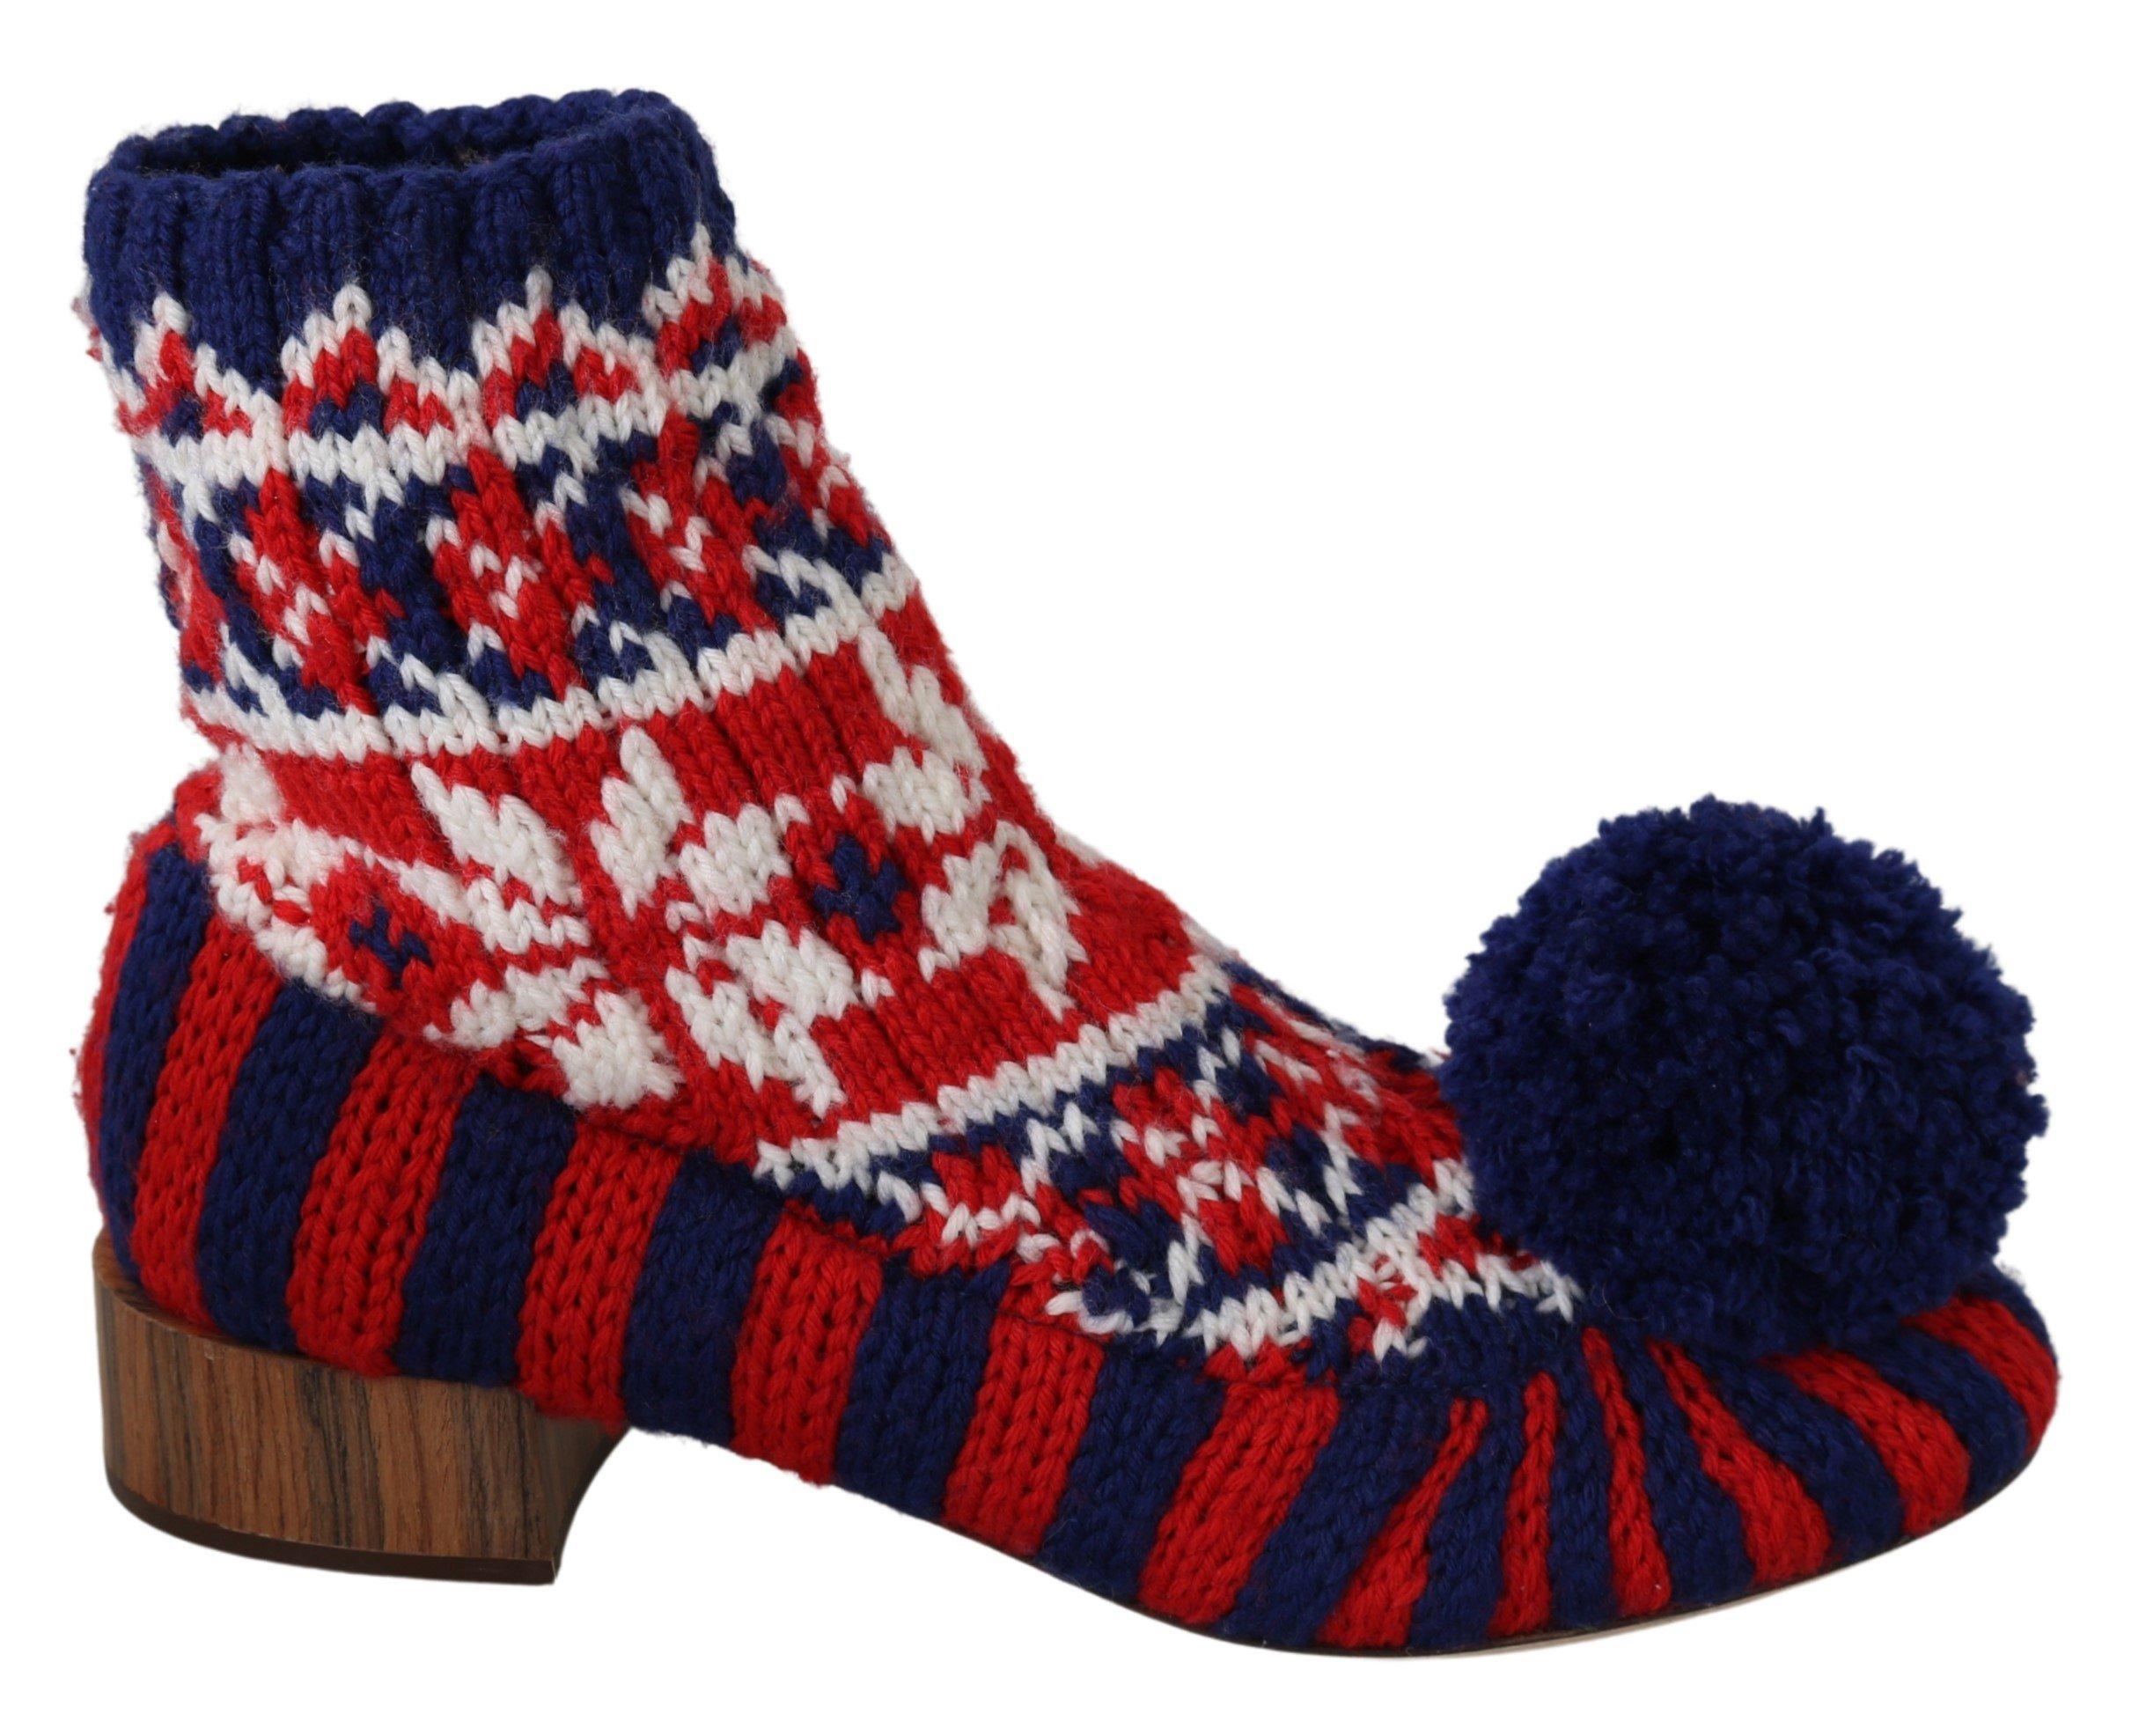 Dolce & Gabbana Women's Knitted Booties Boot Multicolor LA6891 - EU39/US8.5